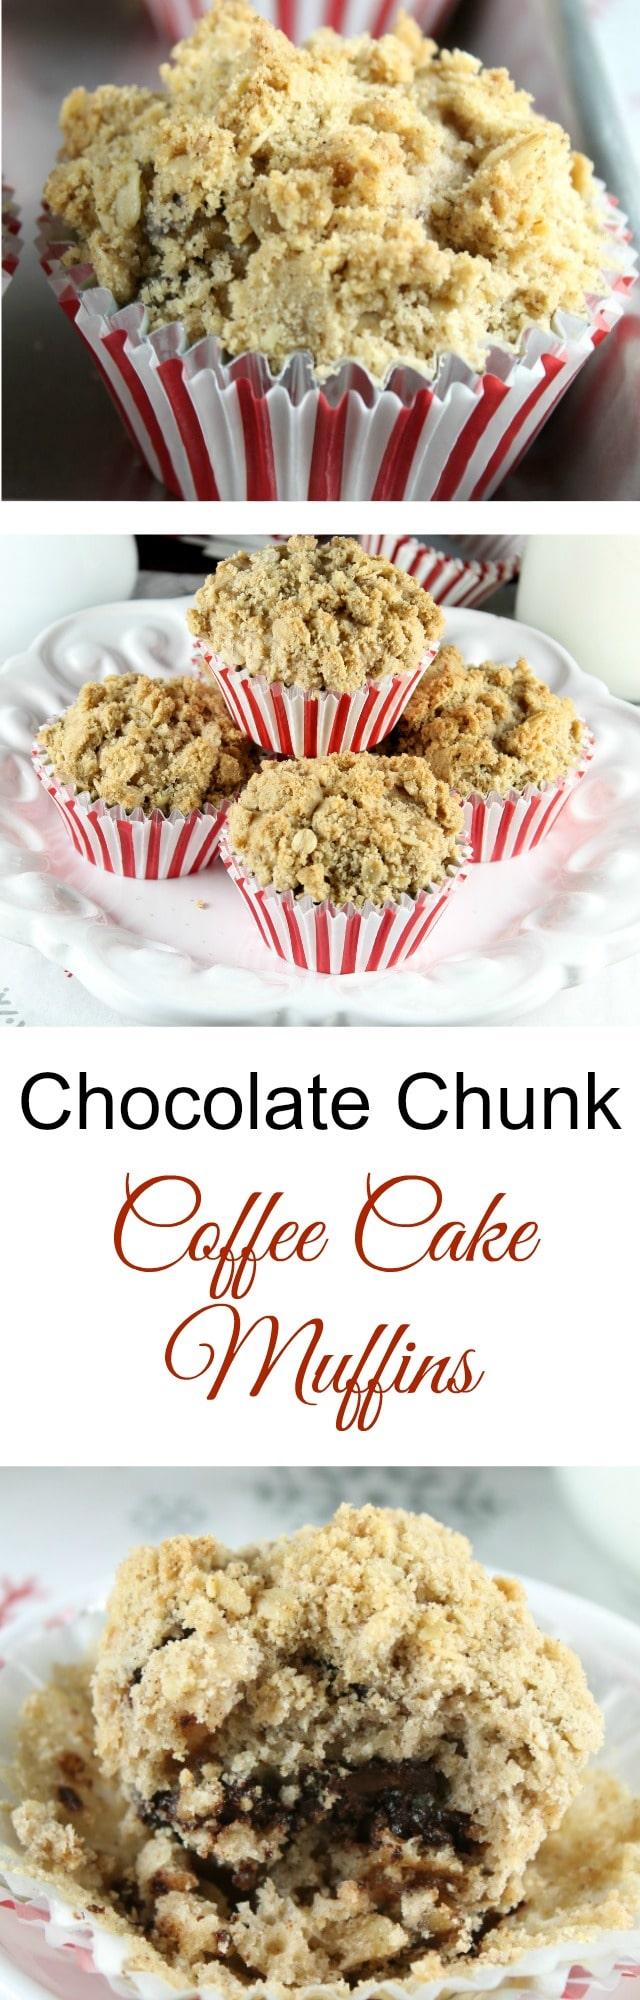 Recipe for Chocolate Chunk Coffee Cake Muffins made with Red Star Yeast Platinum ~ MissintheKitchen.com #sponsored